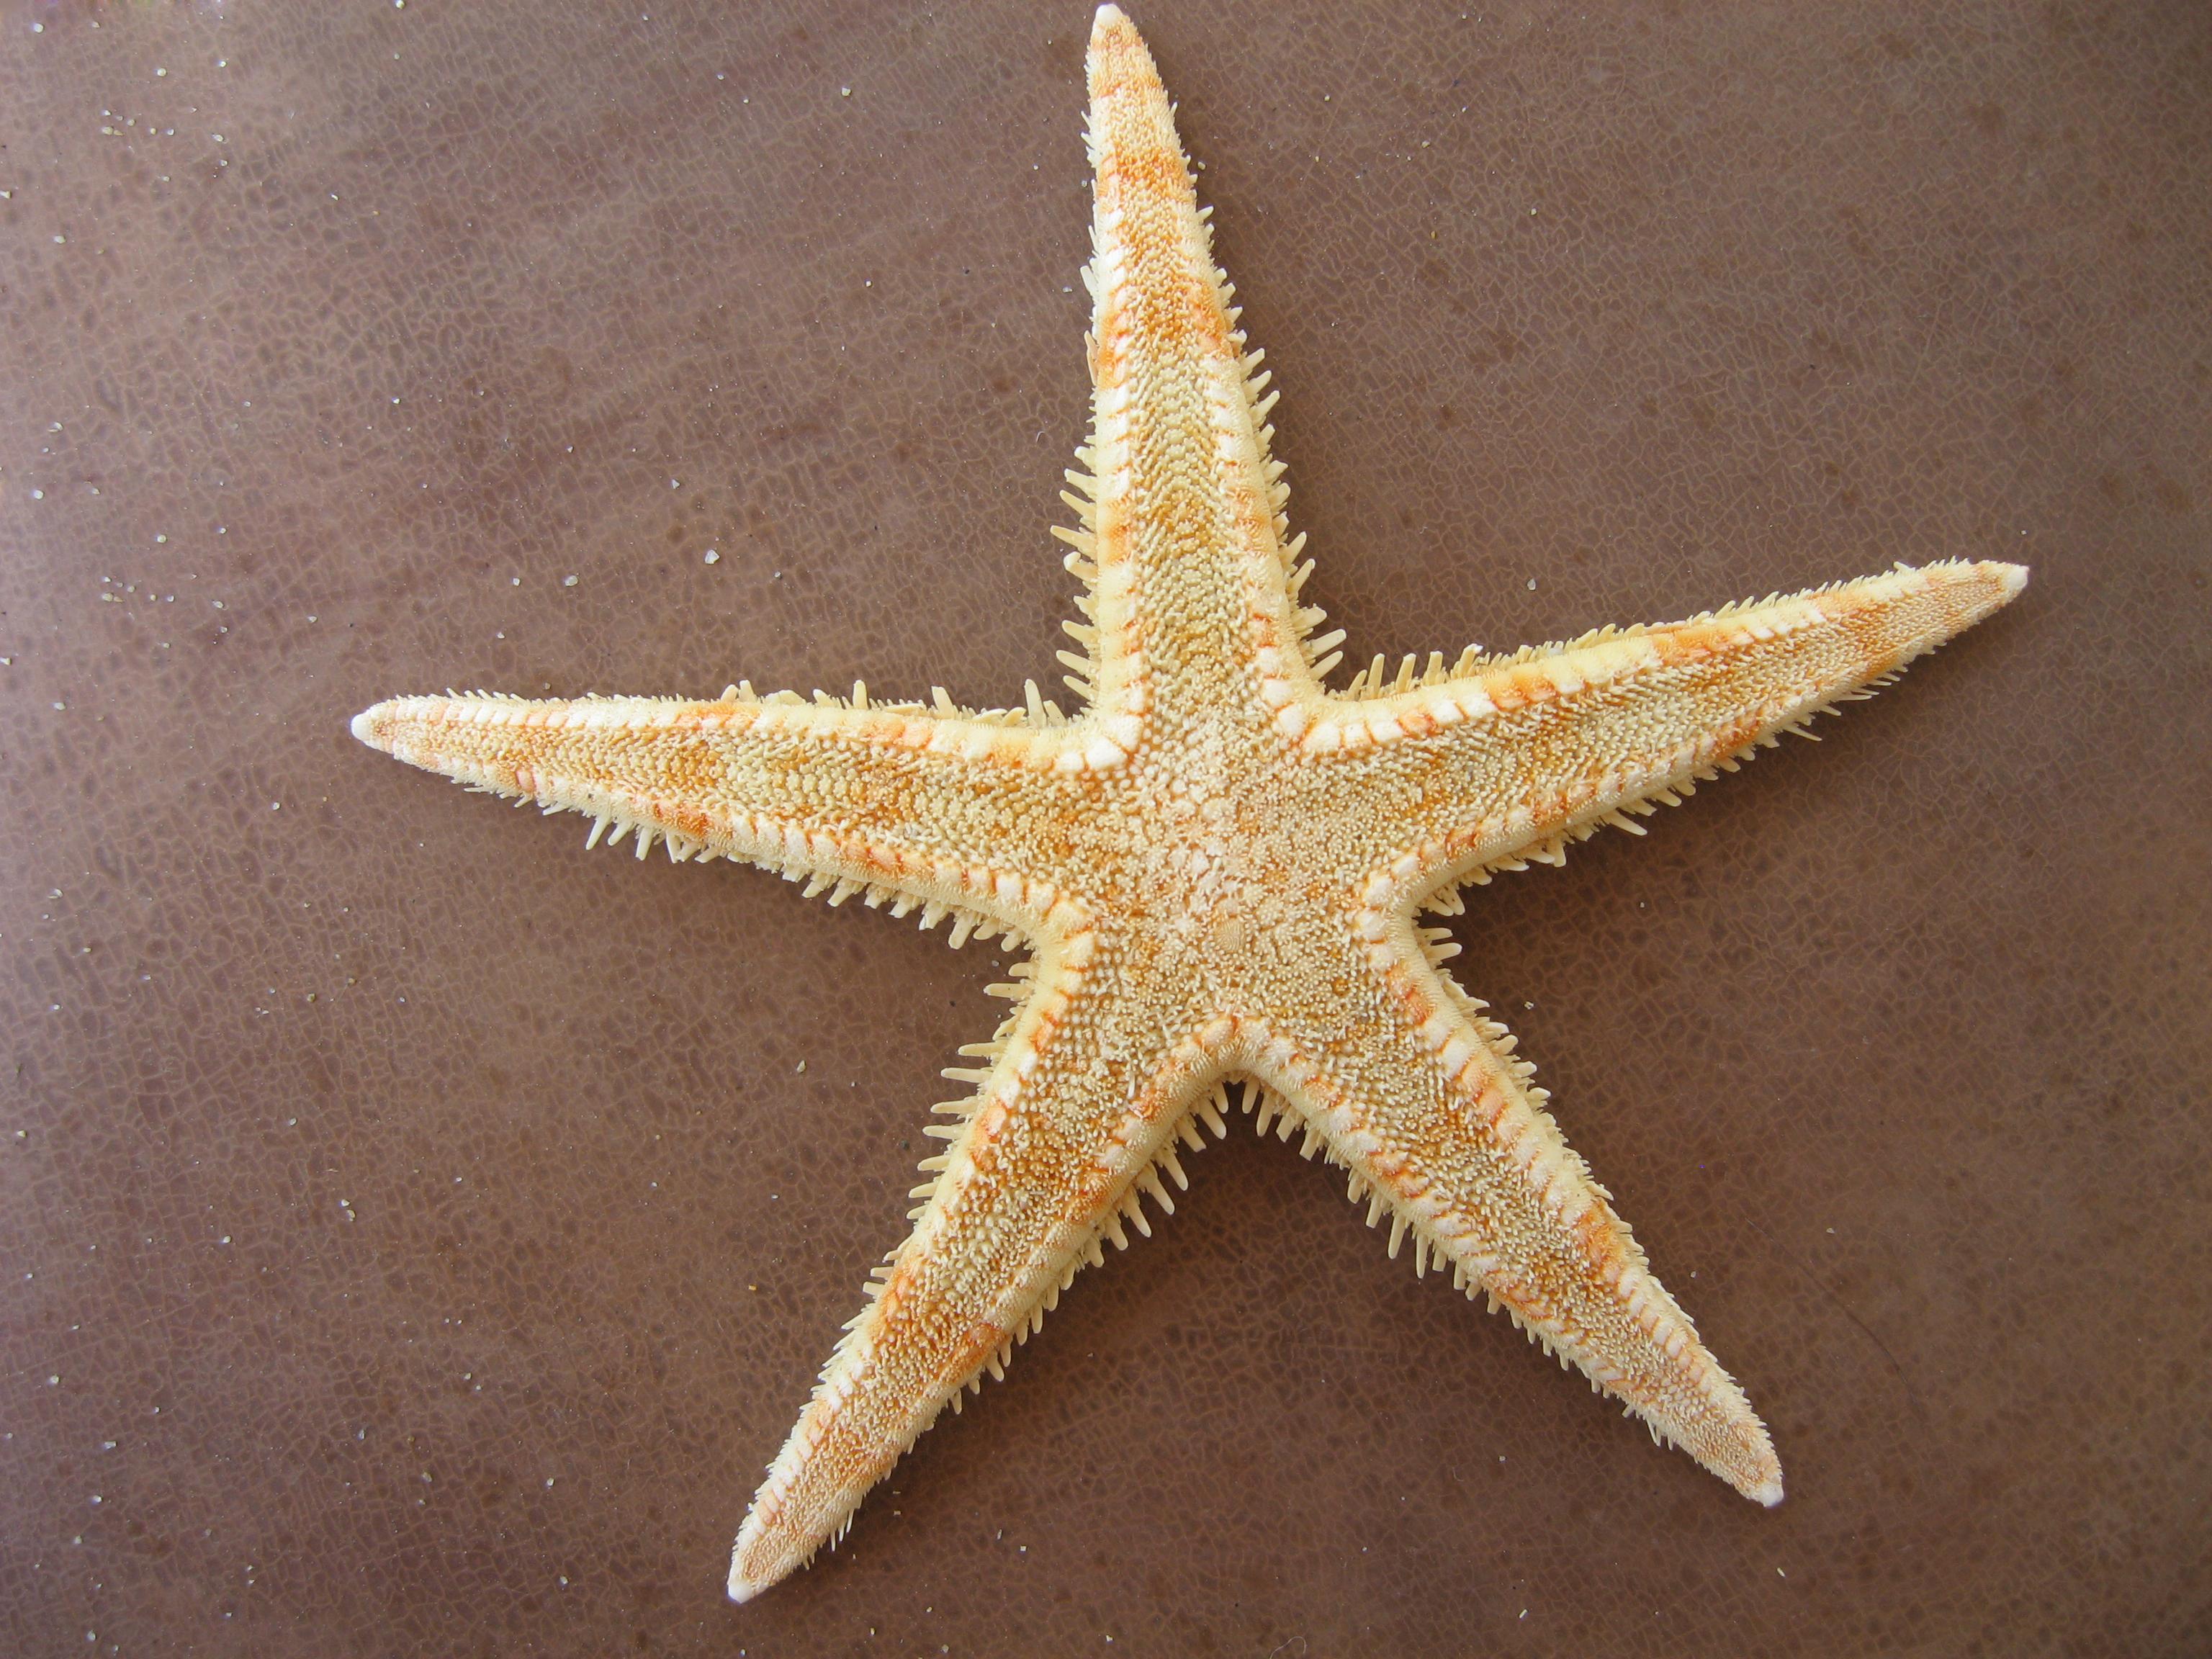 File:Sea star bg 01.jpg - Wikimedia Commons